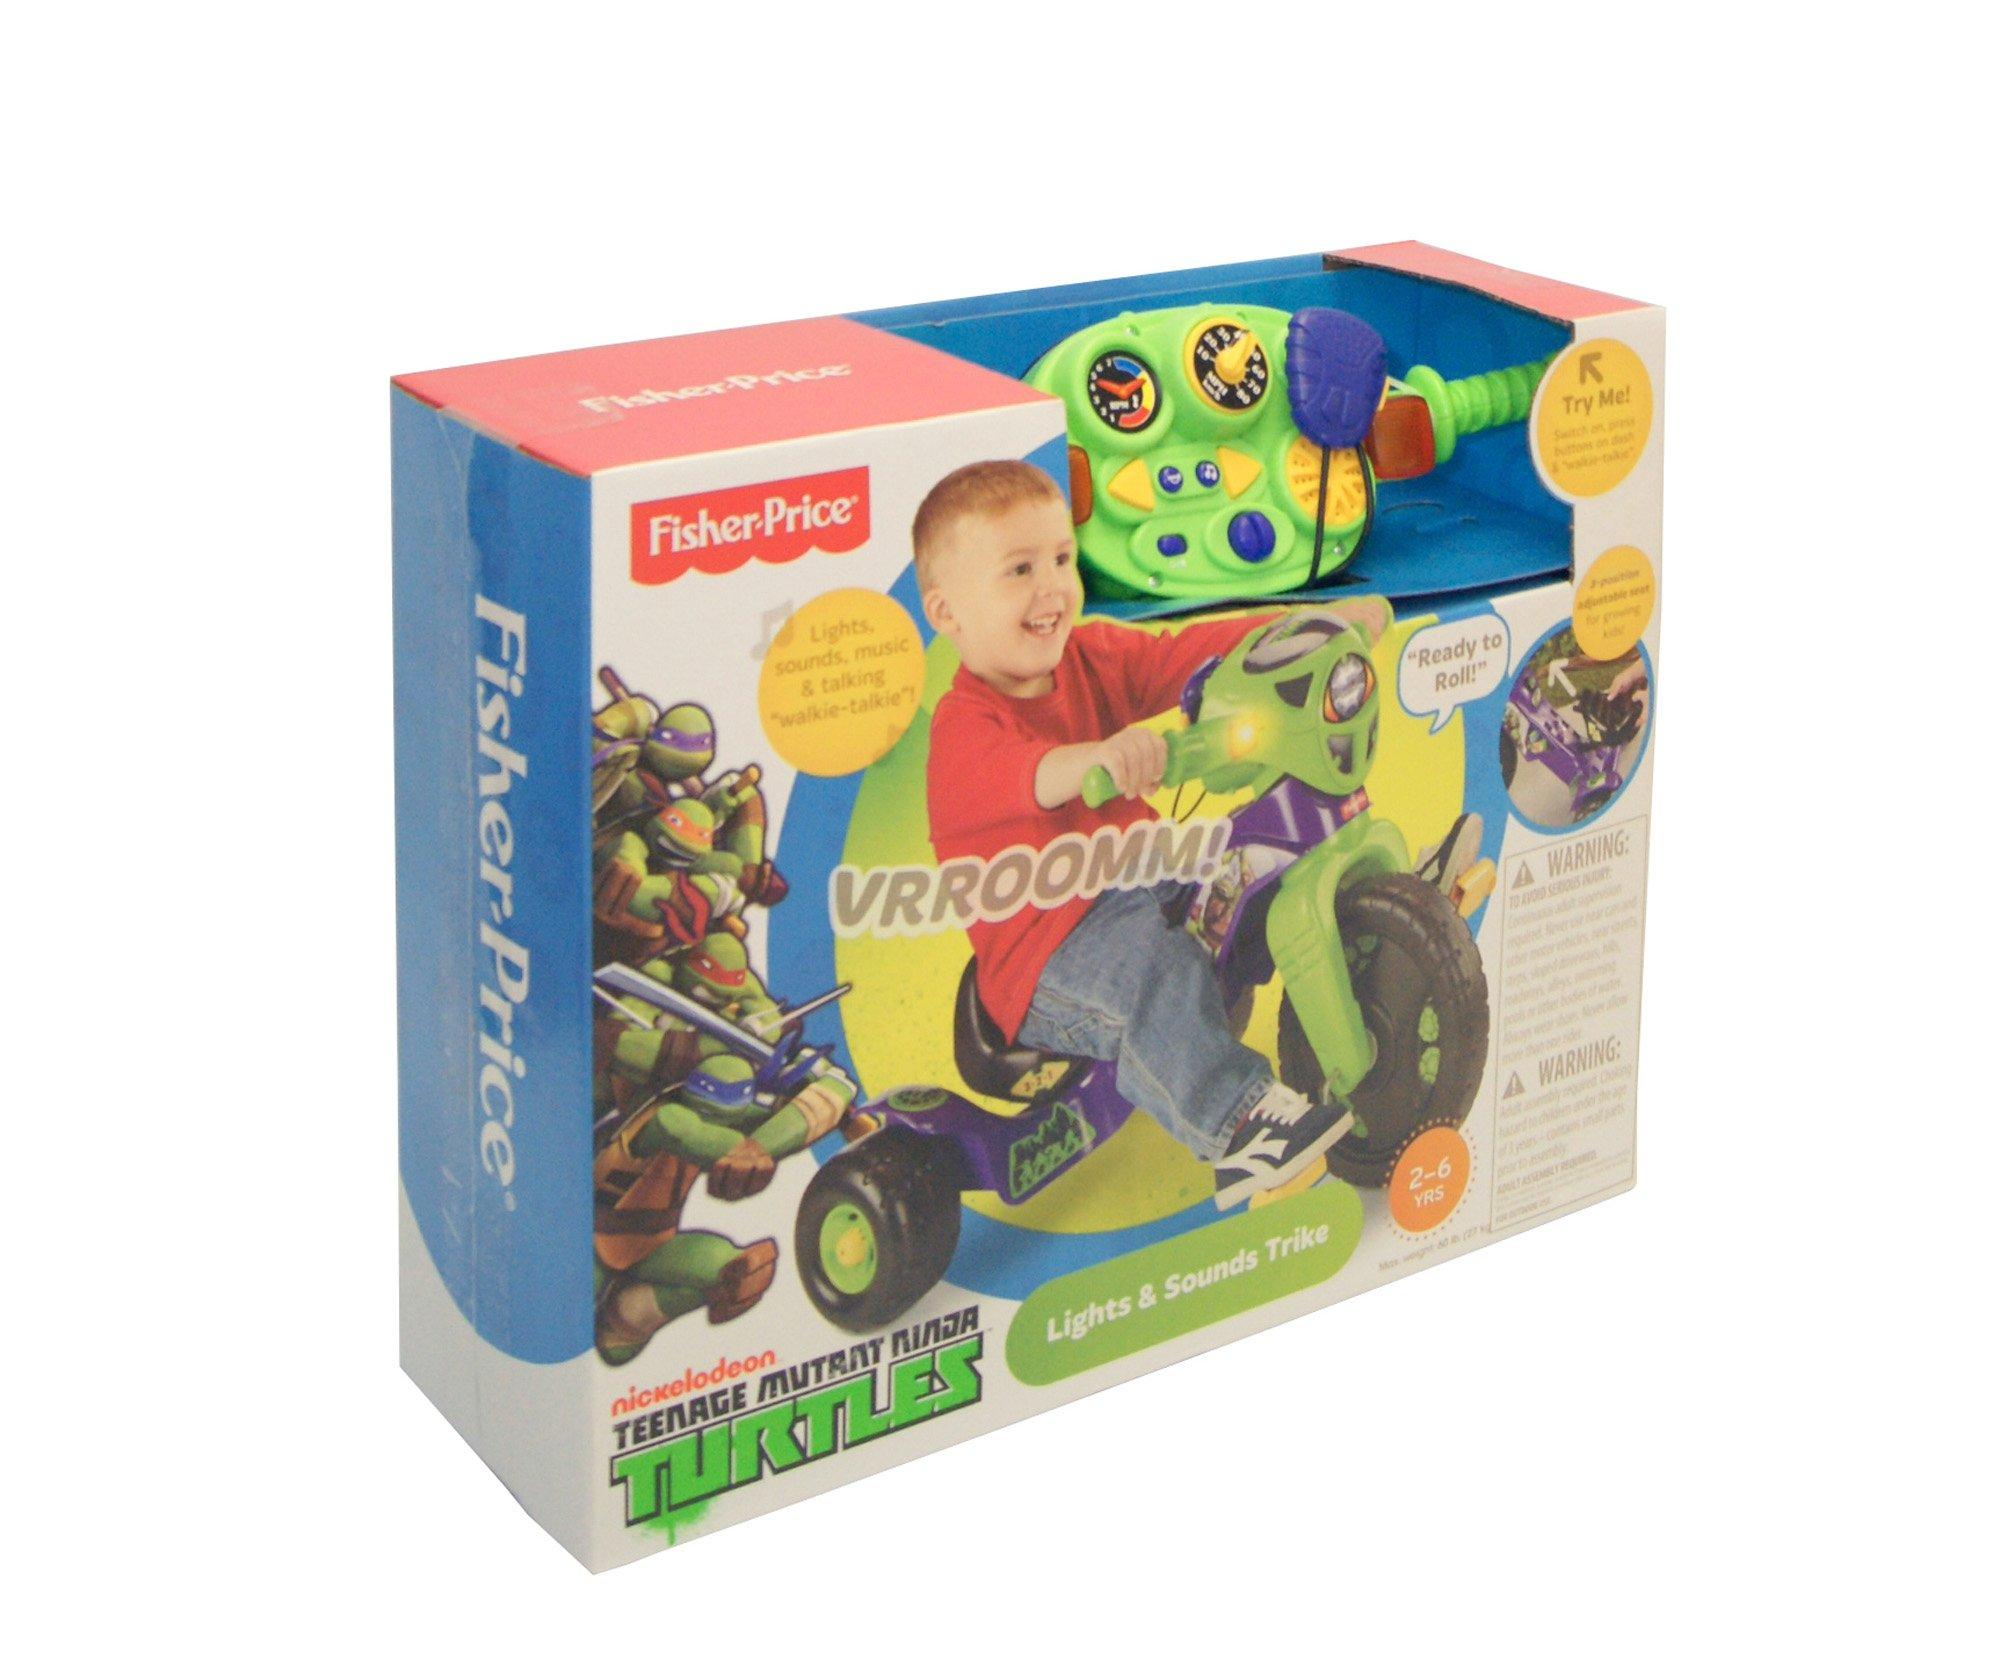 Fisher-Price Nickelodeon Teenage Mutant Ninja Turtles Lights & Sounds Trike by Fisher-Price